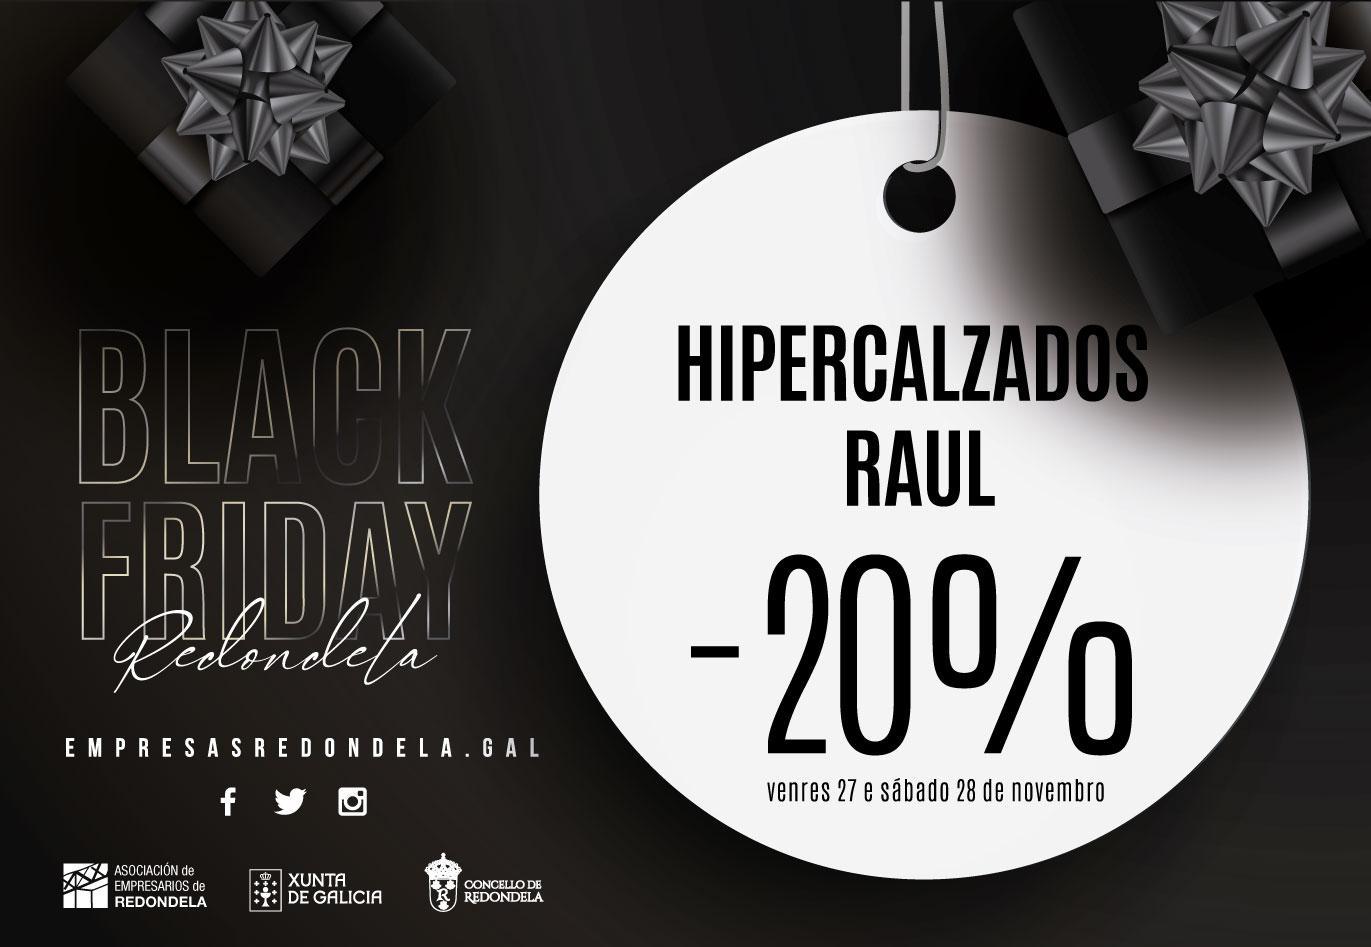 HIPERCALZADO-RAUL.jpg